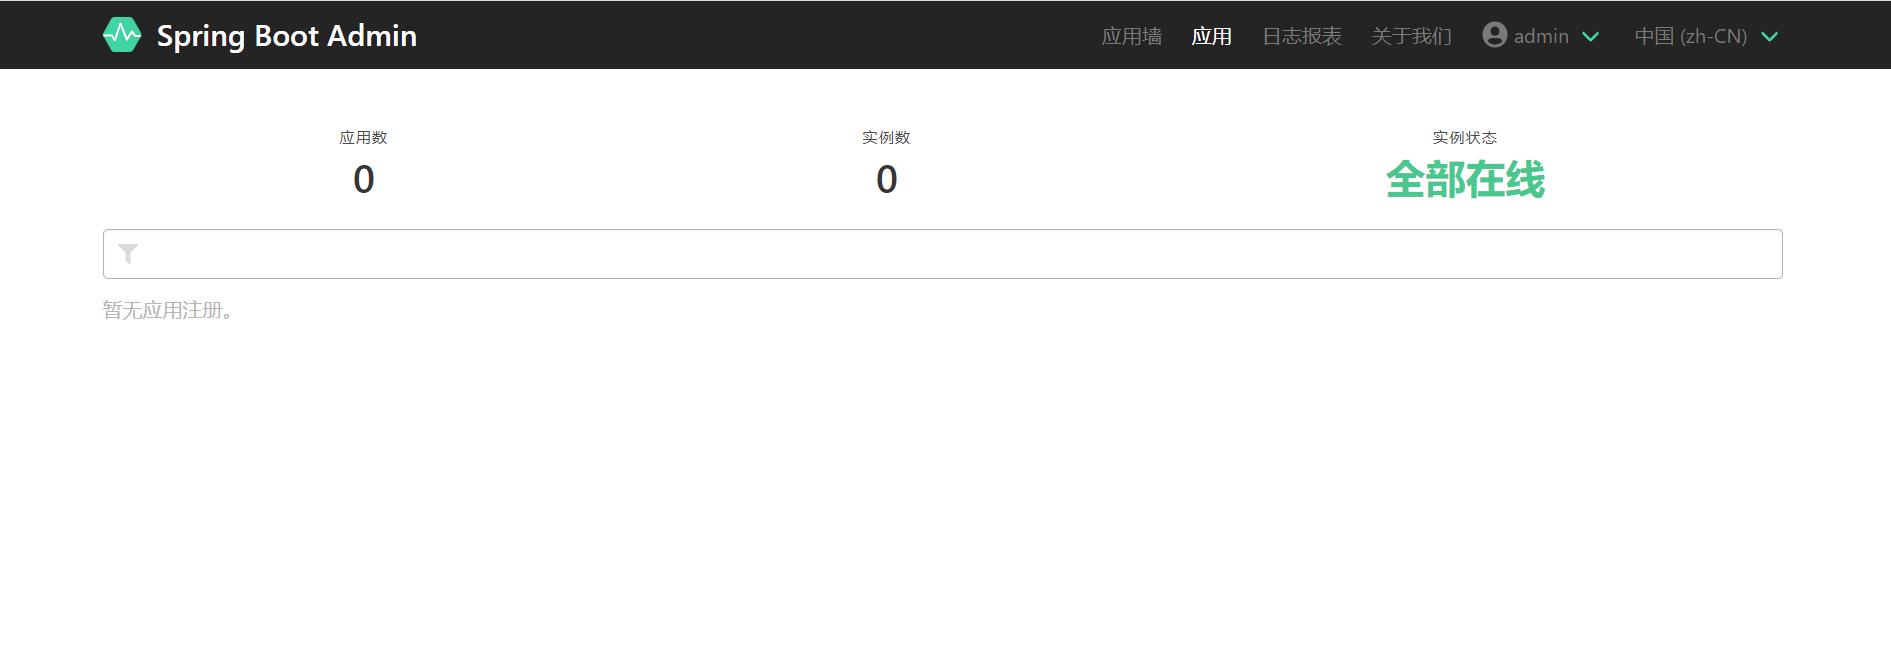 SpringBoot快速整合SpringBootAdmin管控臺監控服務